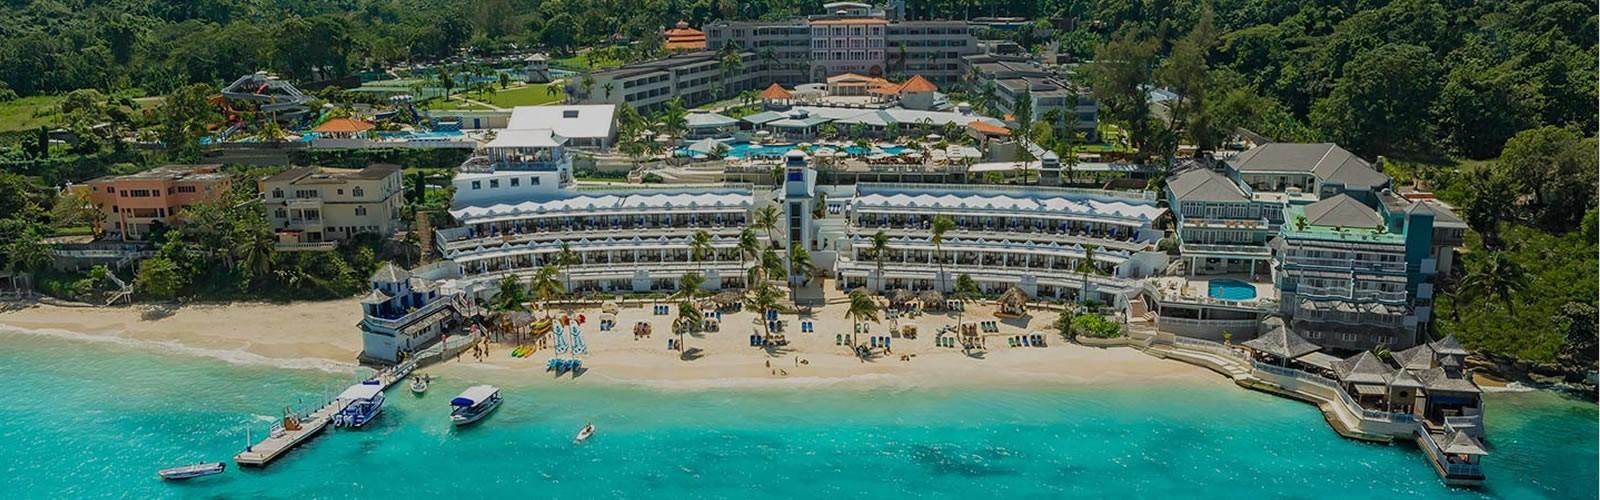 beaches-header-pure-destinations-partner